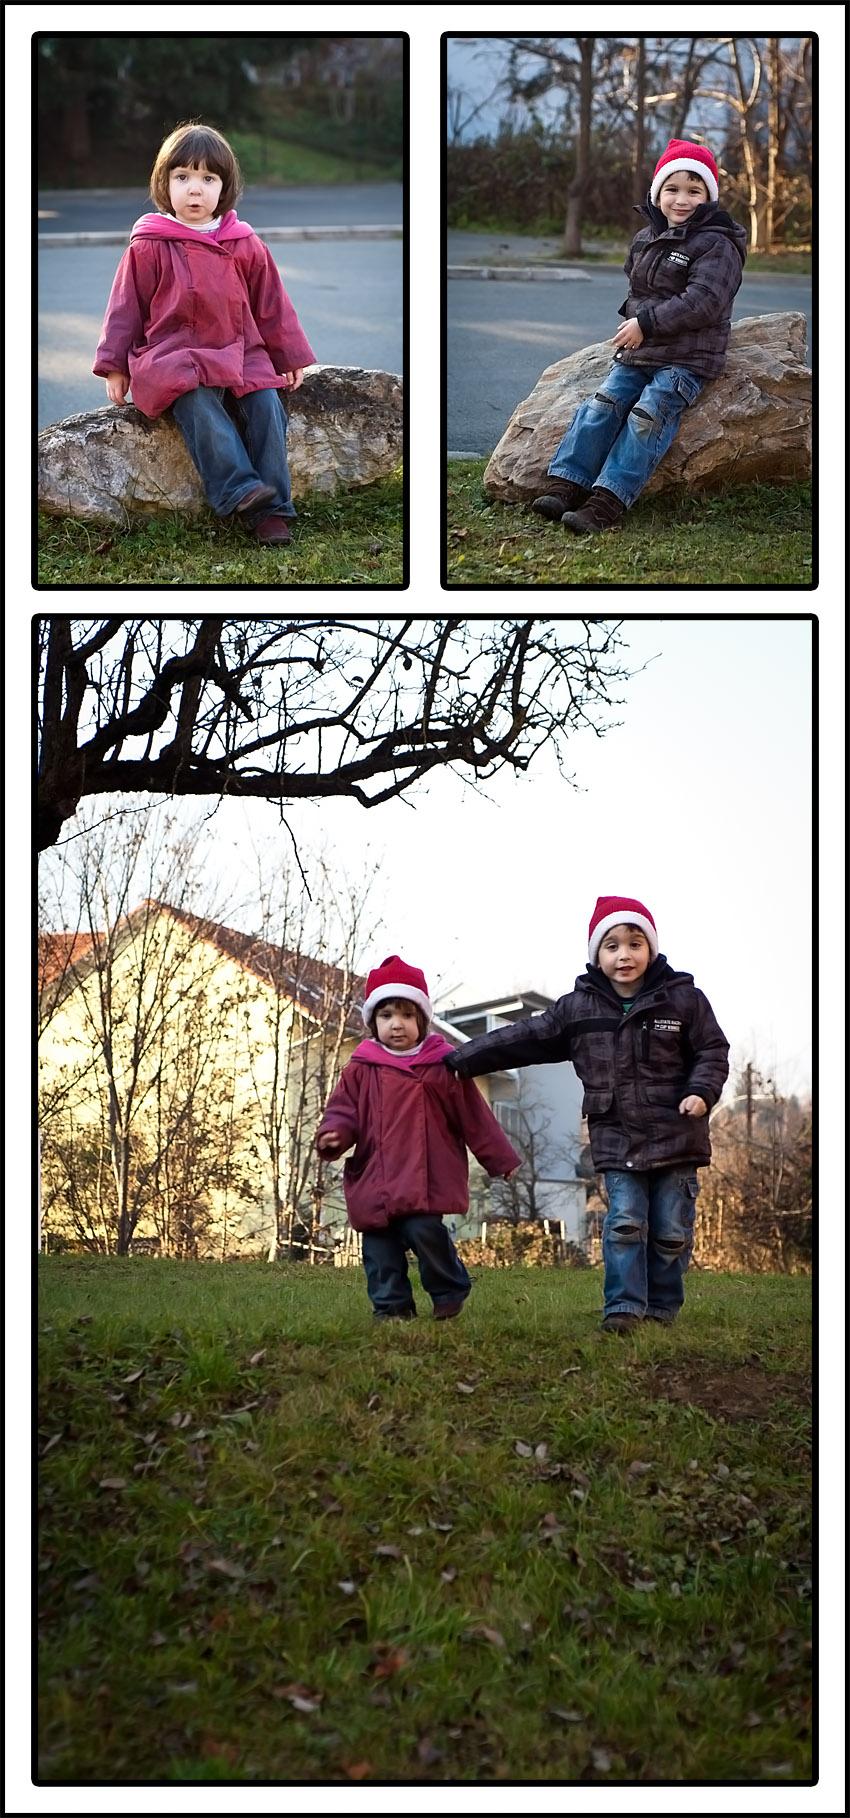 http://fredetsev.eu/imagespourblog/Enfants_cheminecole_02.jpg